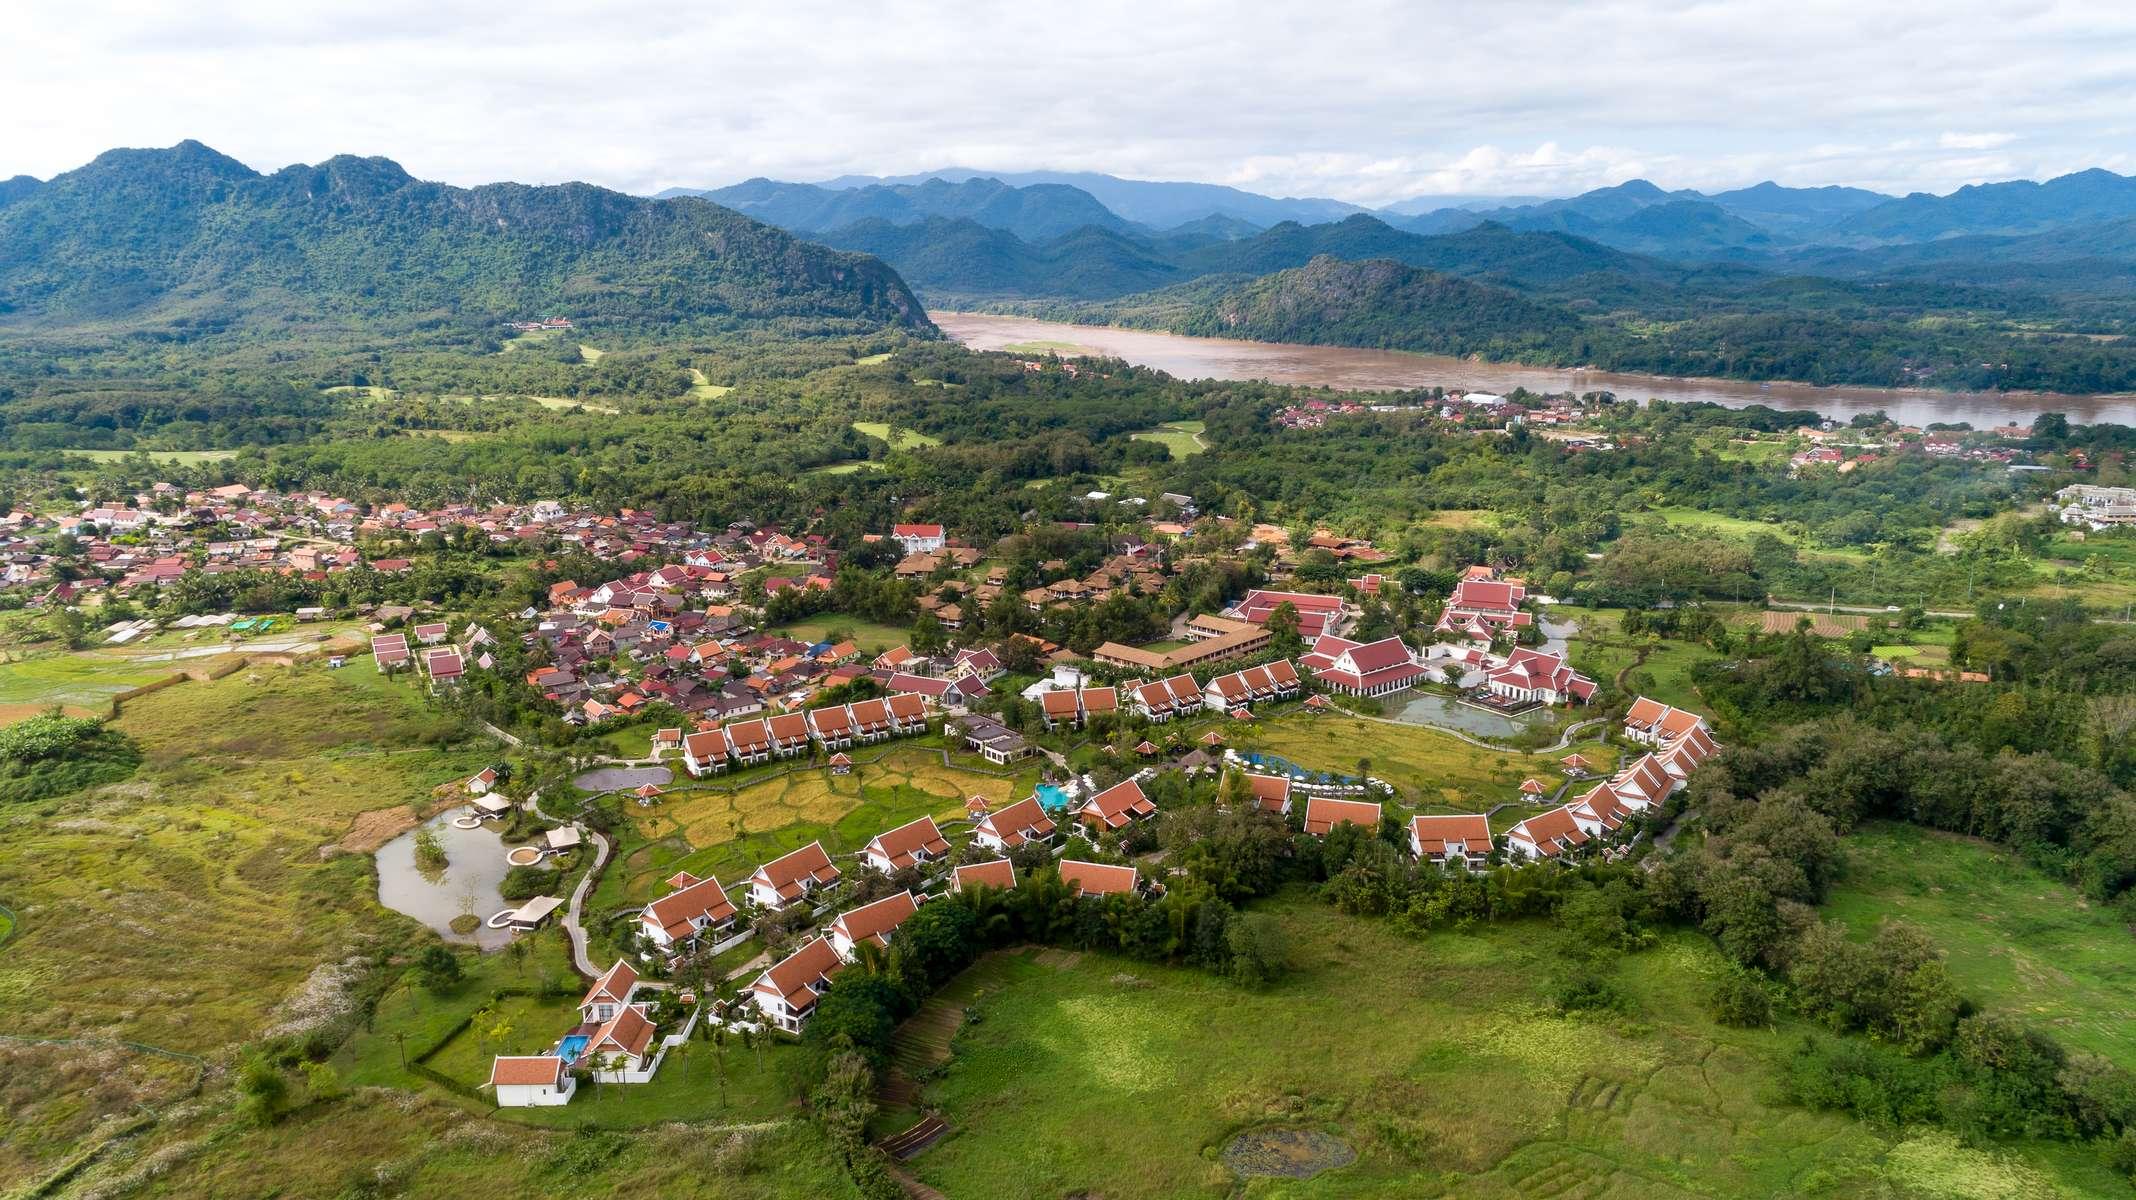 Pullman-Luang-Prabang-Laos-9112-lifestyle-Photo-by-Cyril-Eberle-DJI_0630